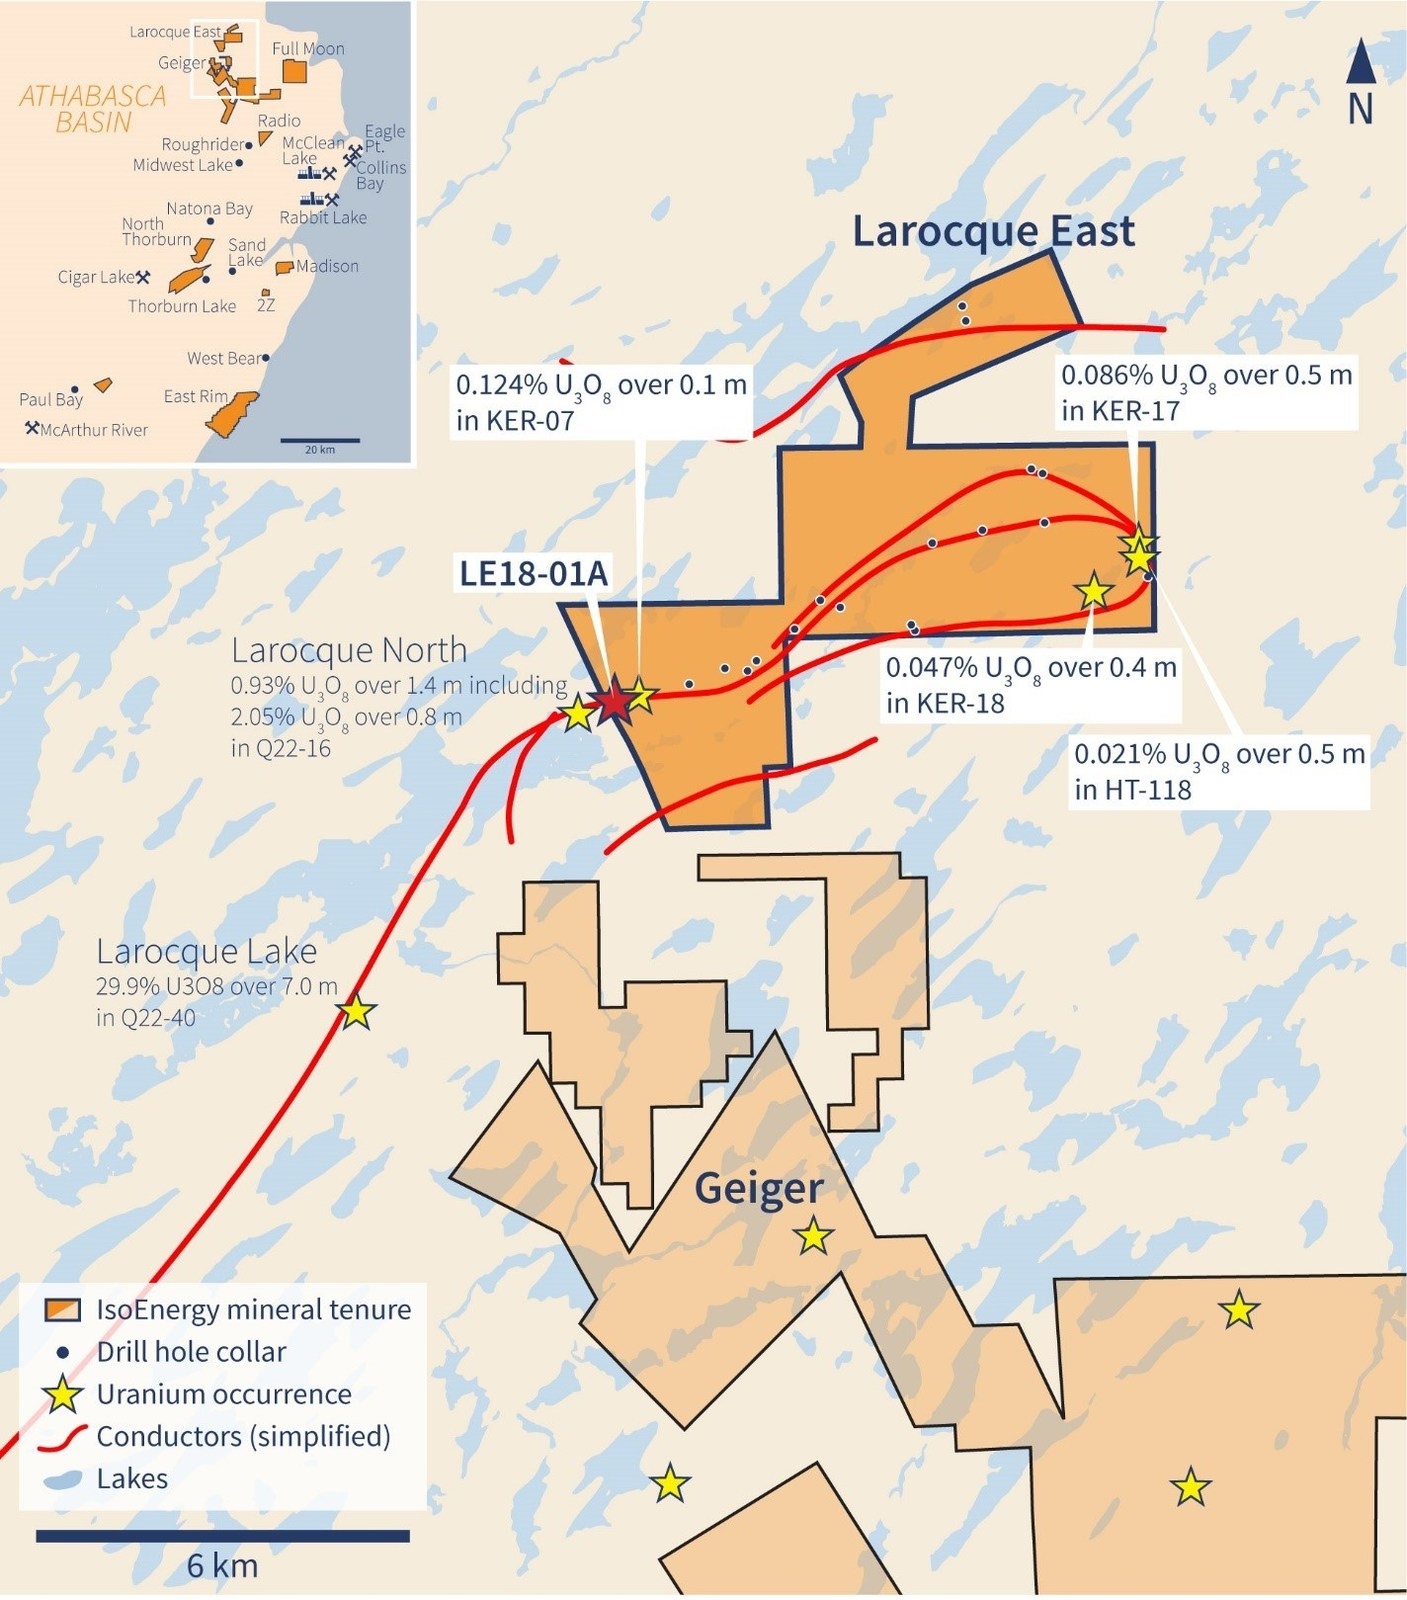 Figure 1 – Larocque East Property Location Map